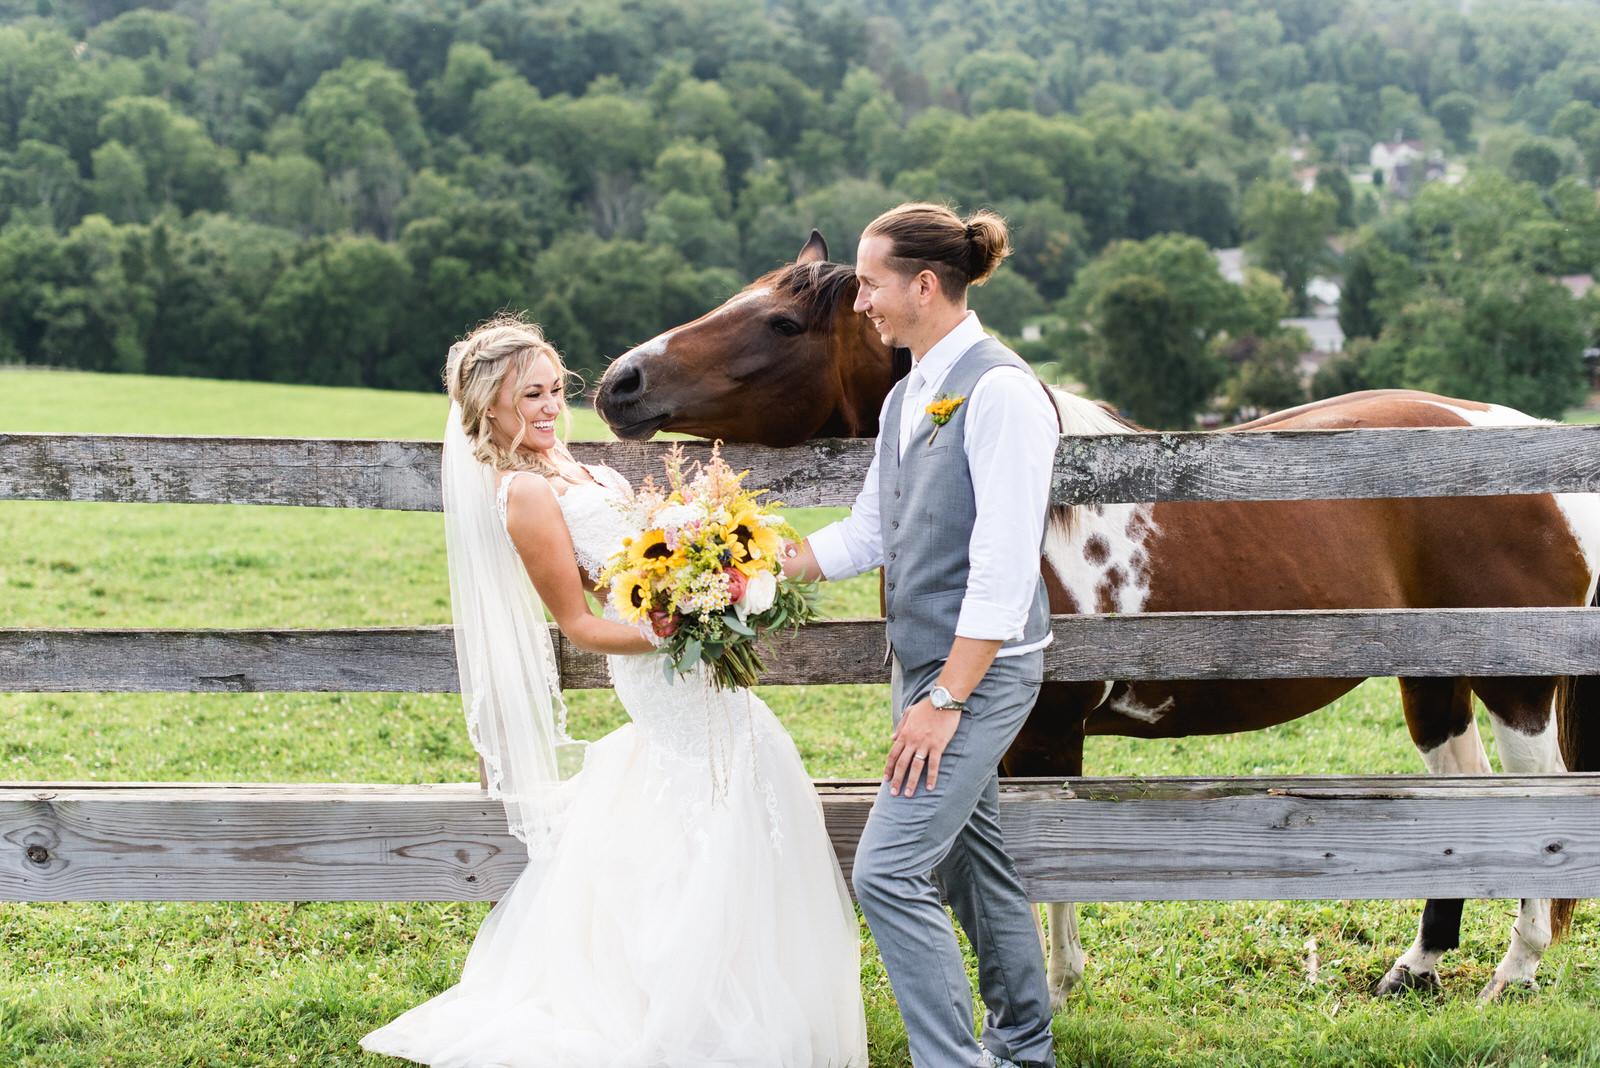 destiny-hill-farm-wedding-photos-pittsburgh-wedding-photographers-64.jpg